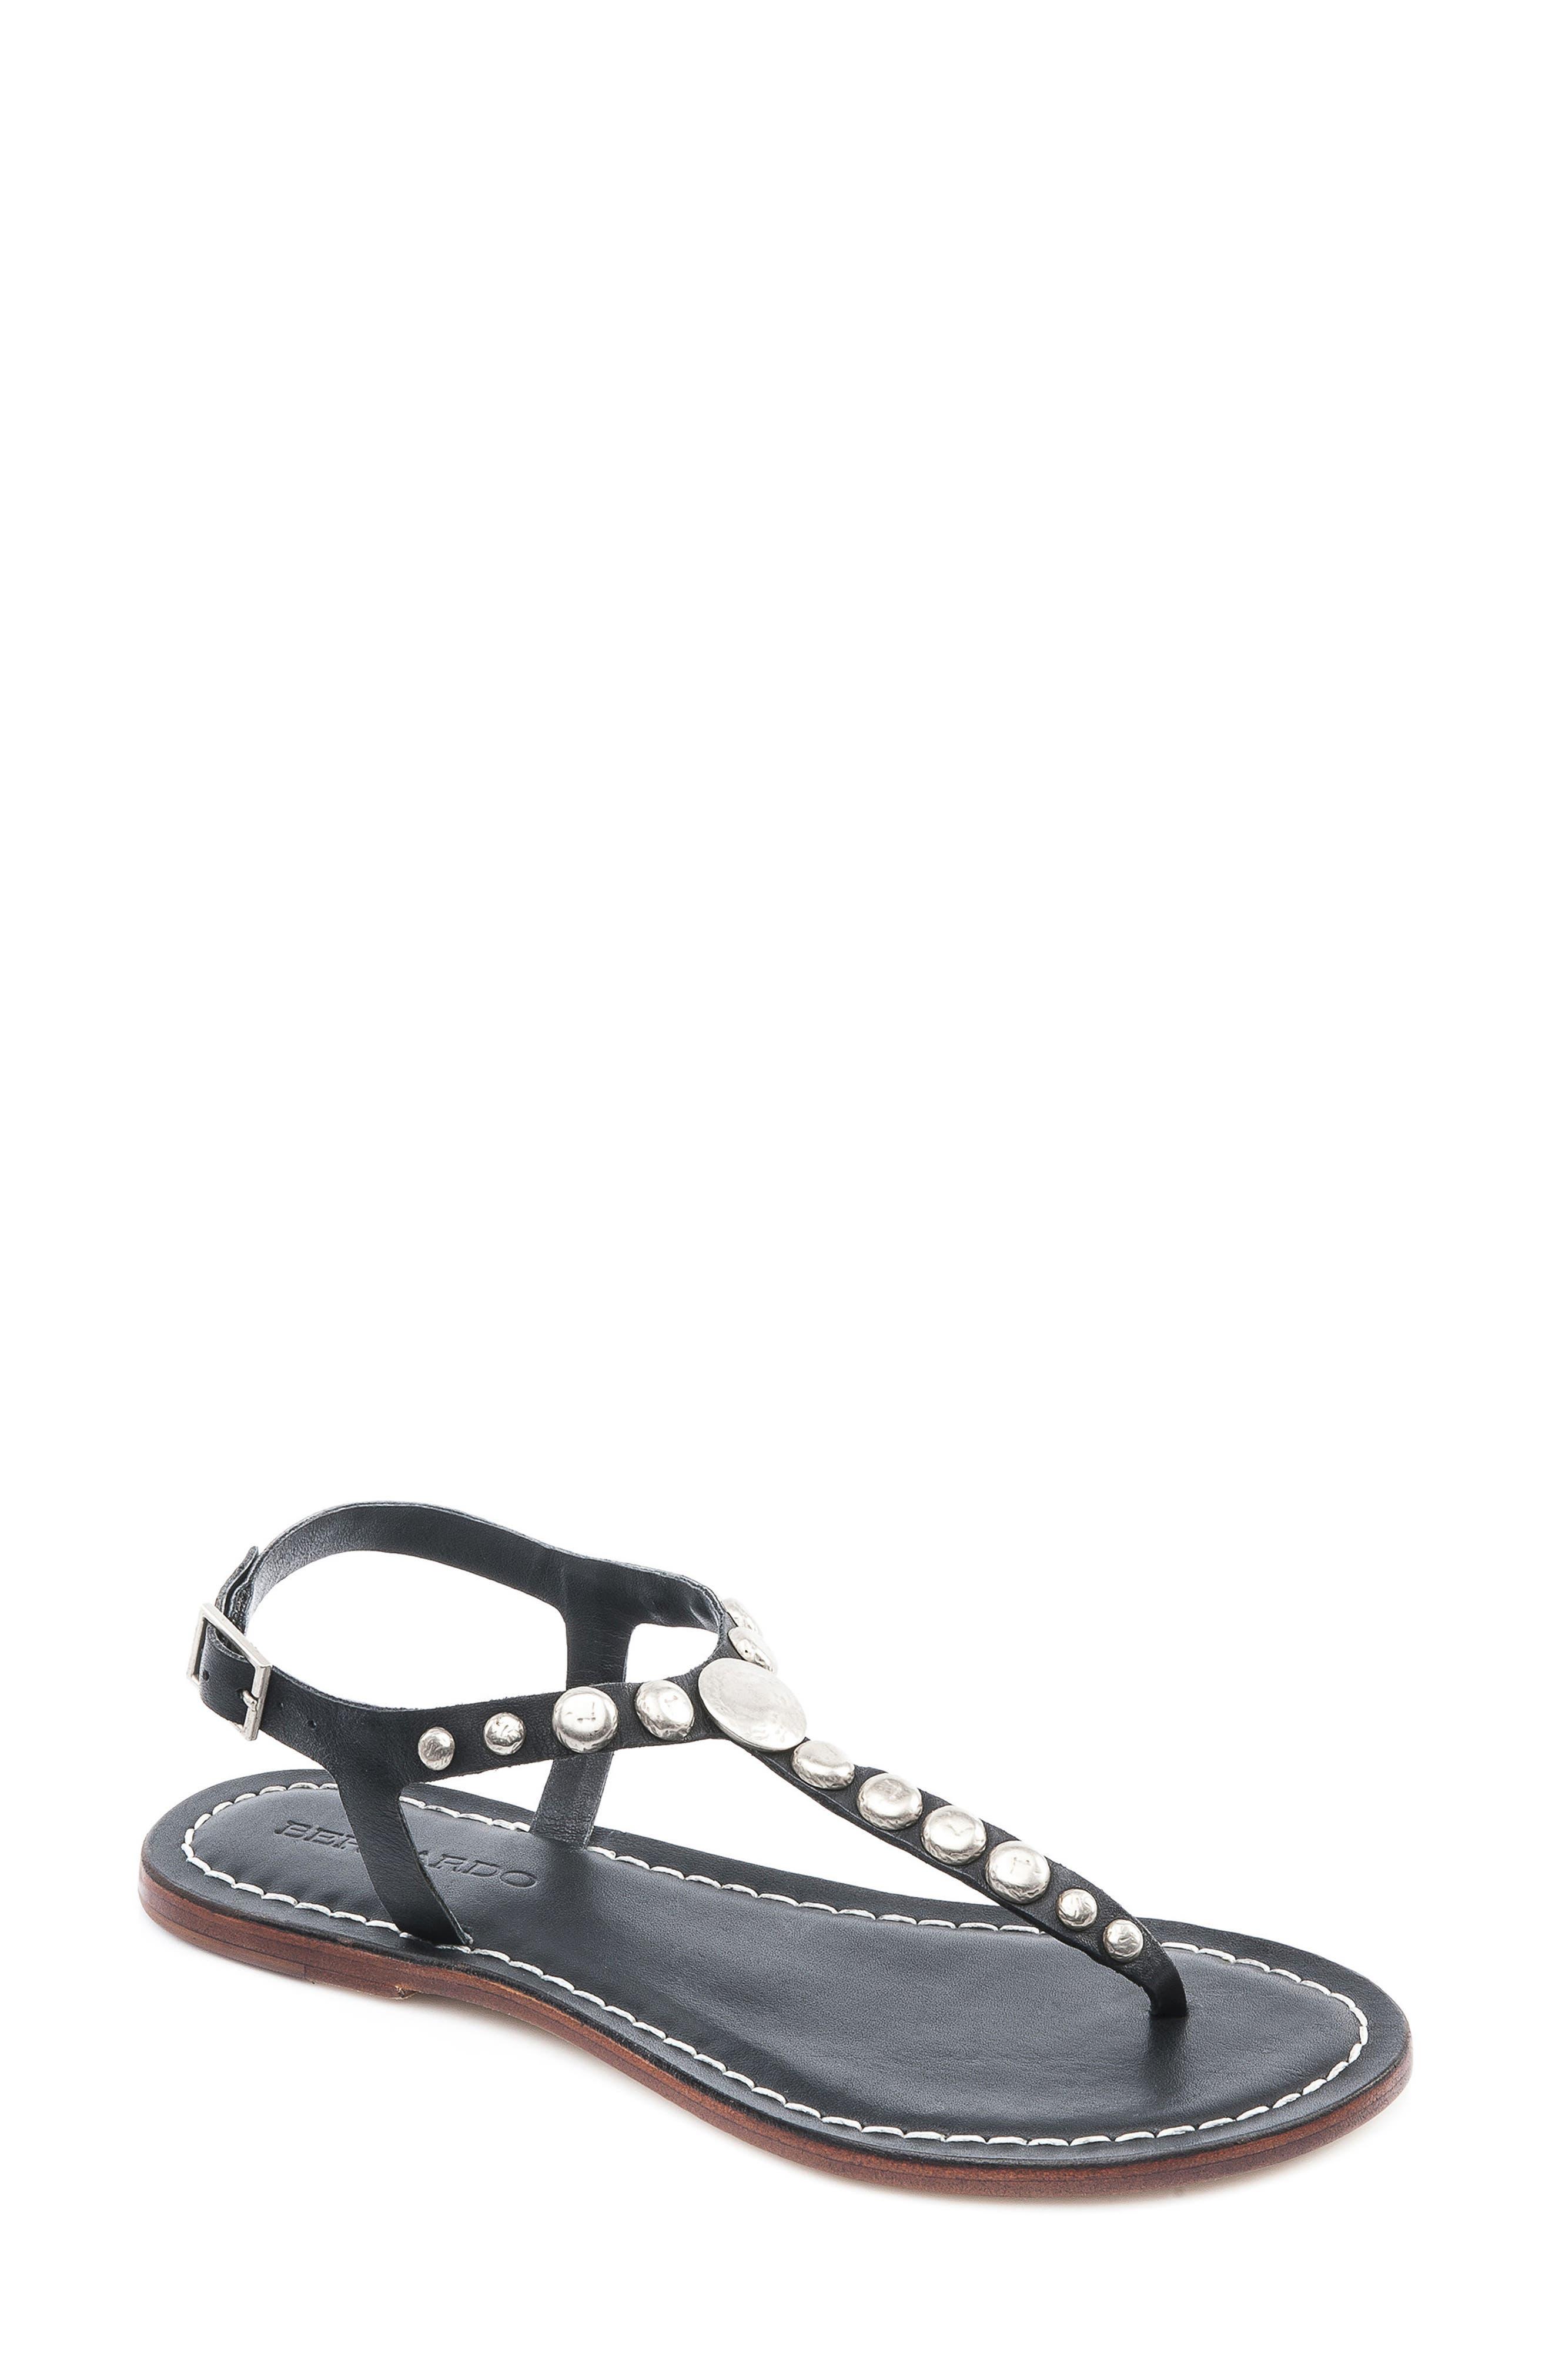 Bernardo 'Mojo' Thong Sandal